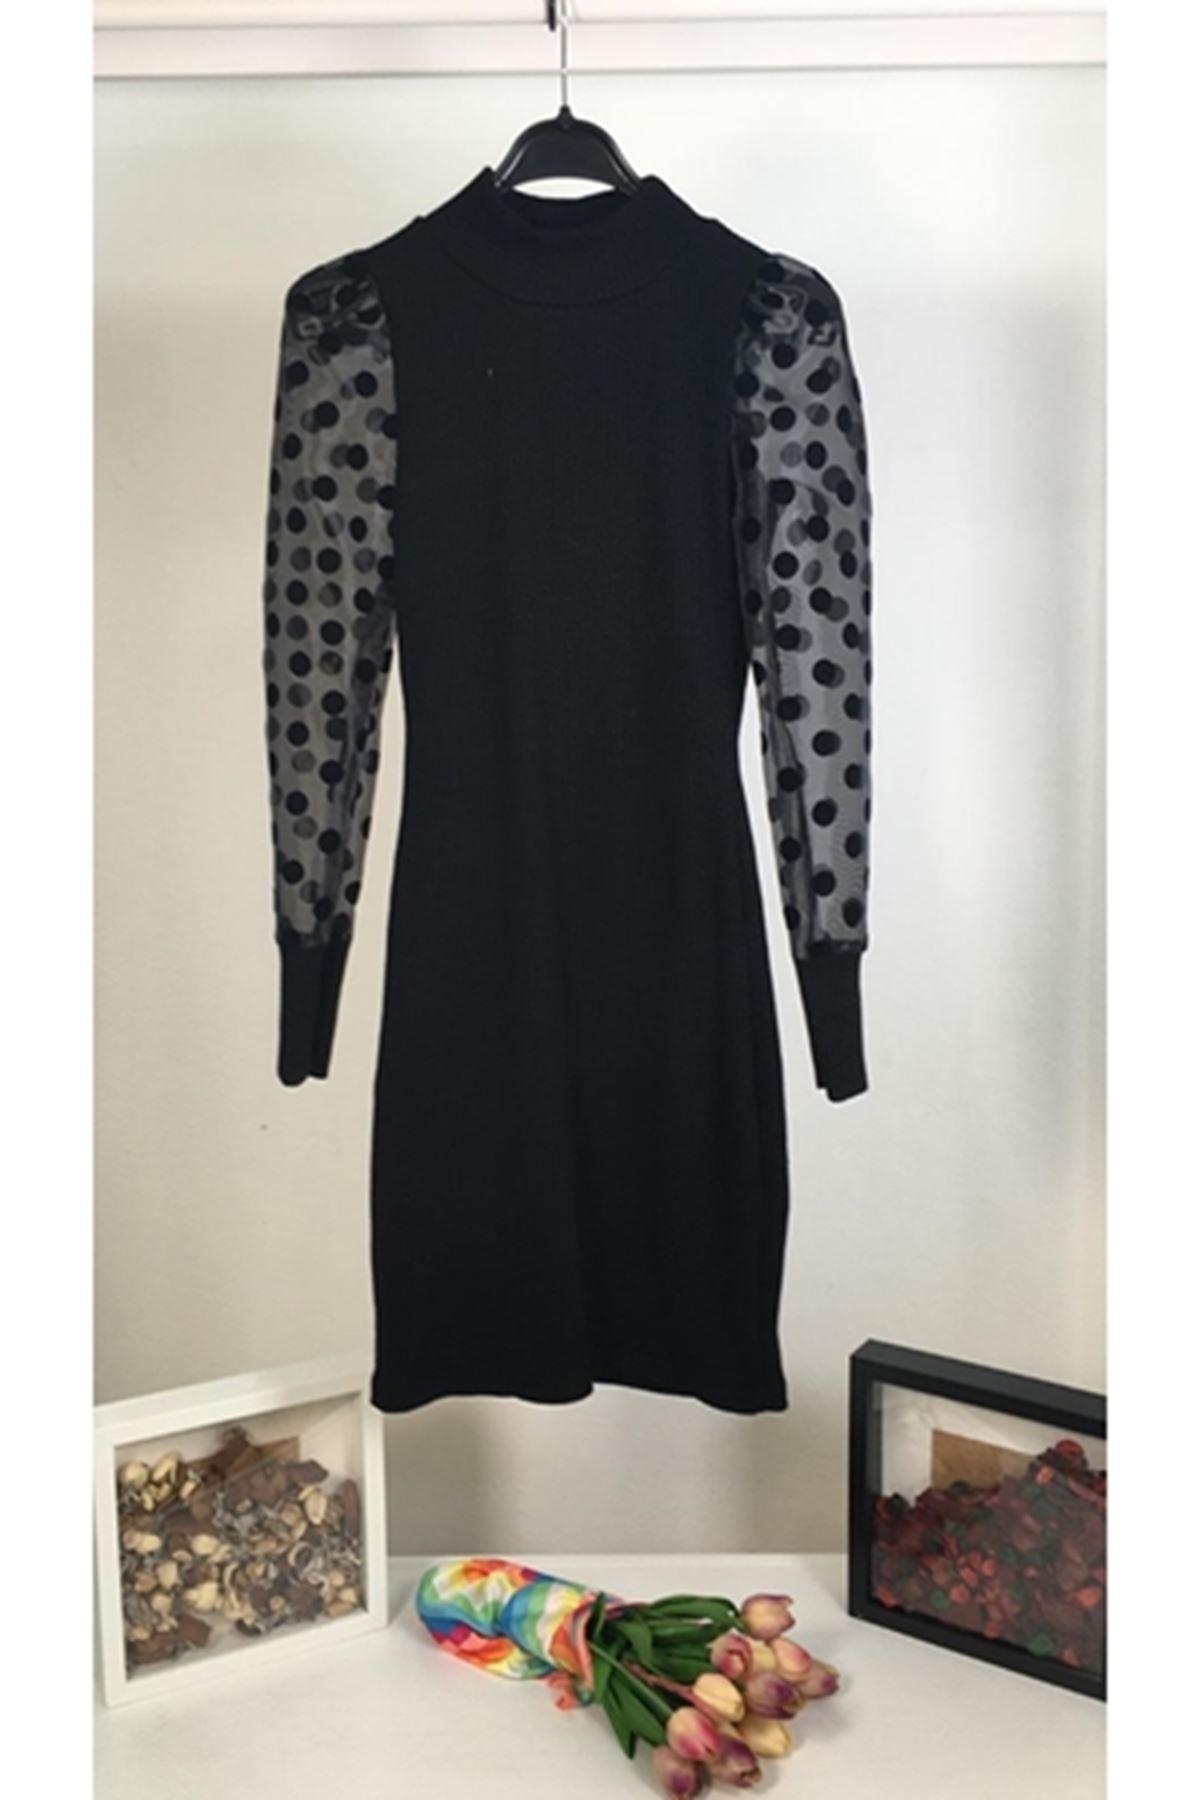 Tül üzeri puanlı akrelik elbise VS163 SİYAH